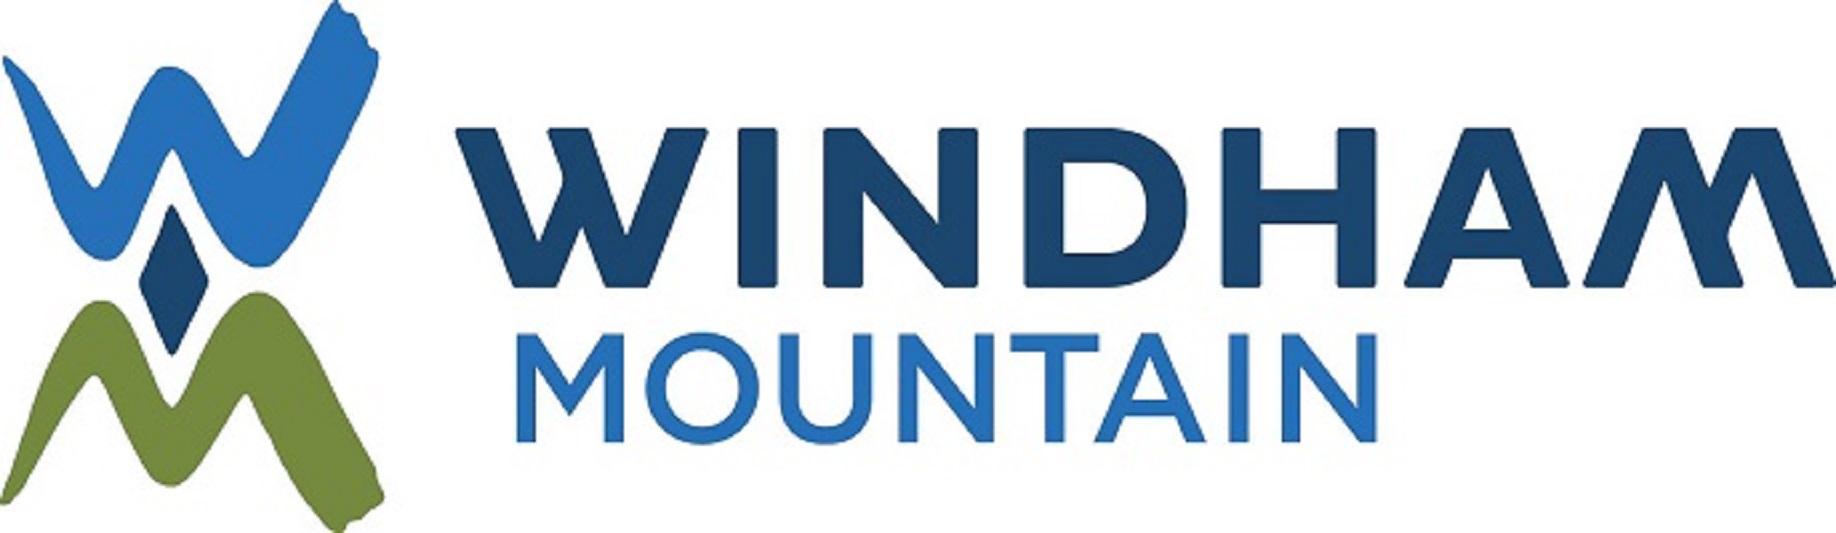 WindhamMountain_Logo_Horizontal.jpg